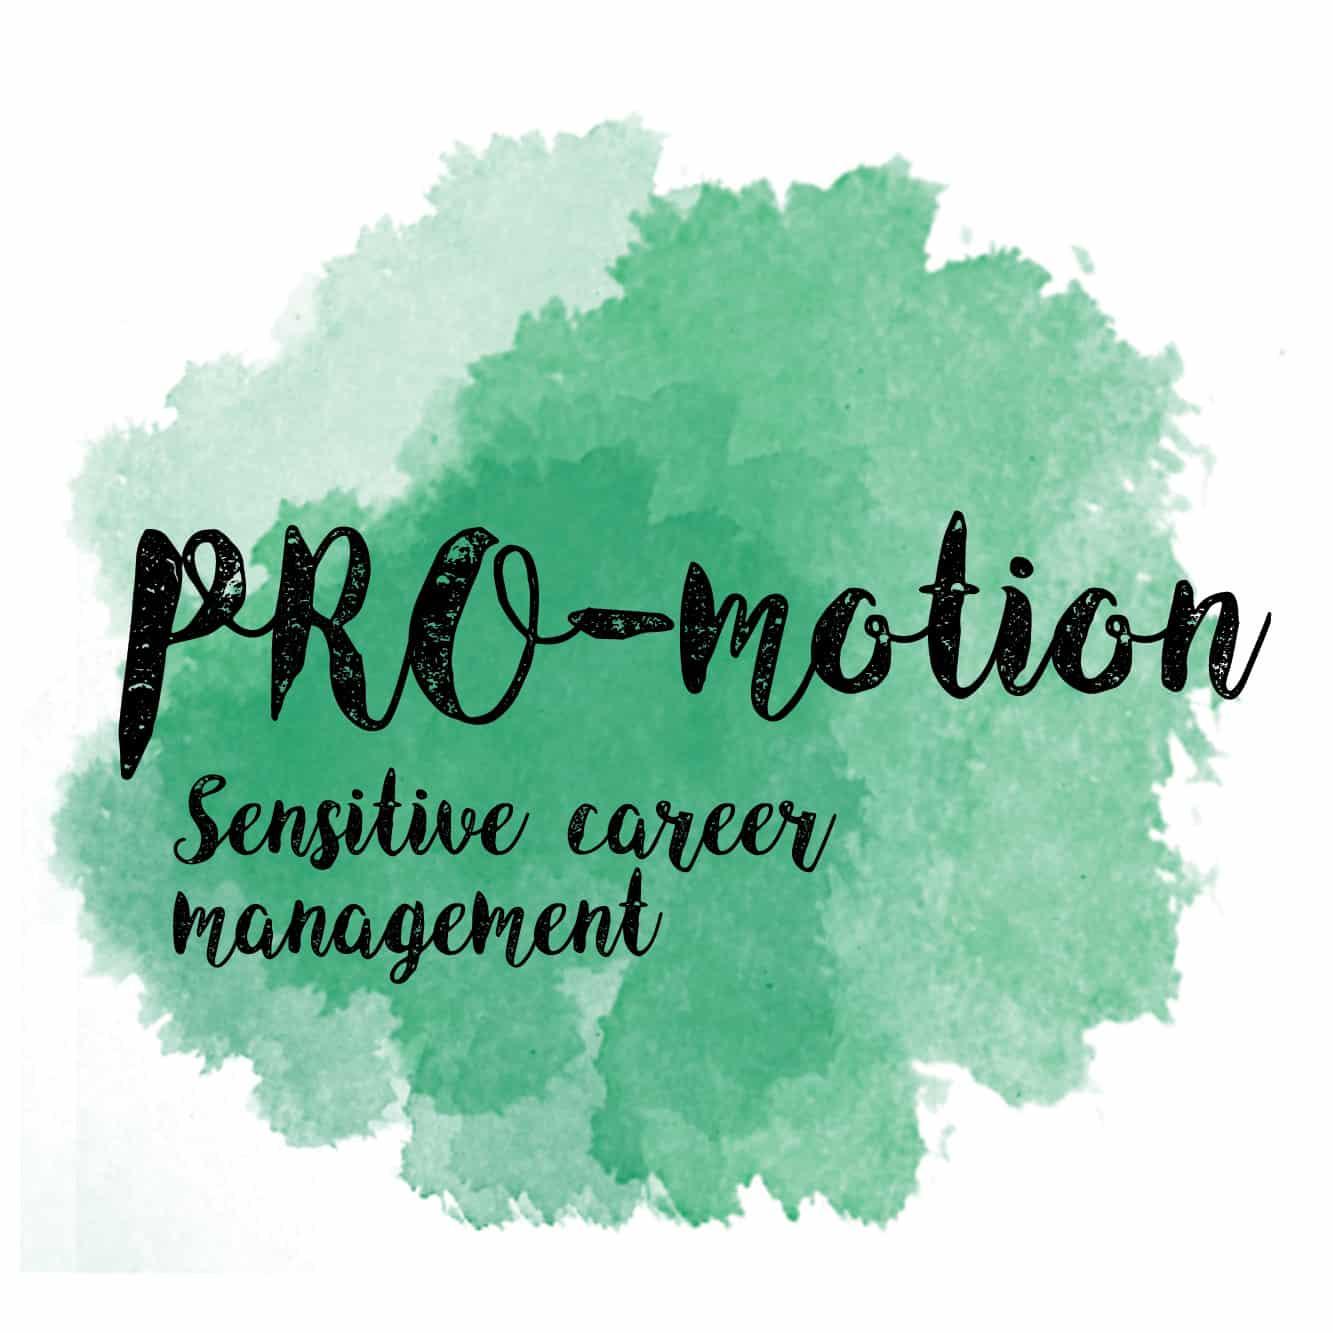 PRO-MOTION. Sensitive career management